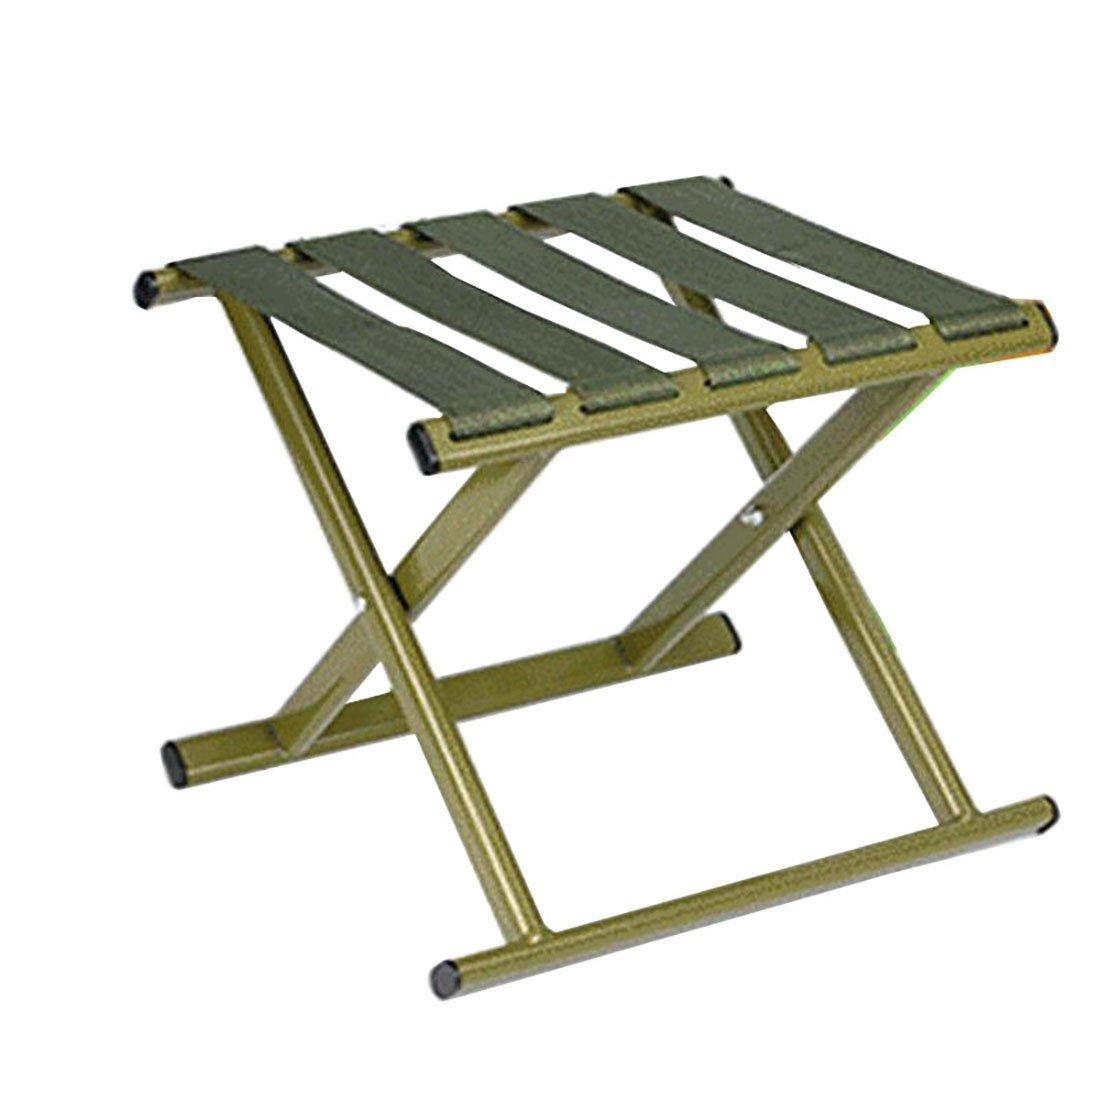 Awe Inspiring Cheap Walkstool Tripod Stool Comfort Find Walkstool Tripod Cjindustries Chair Design For Home Cjindustriesco